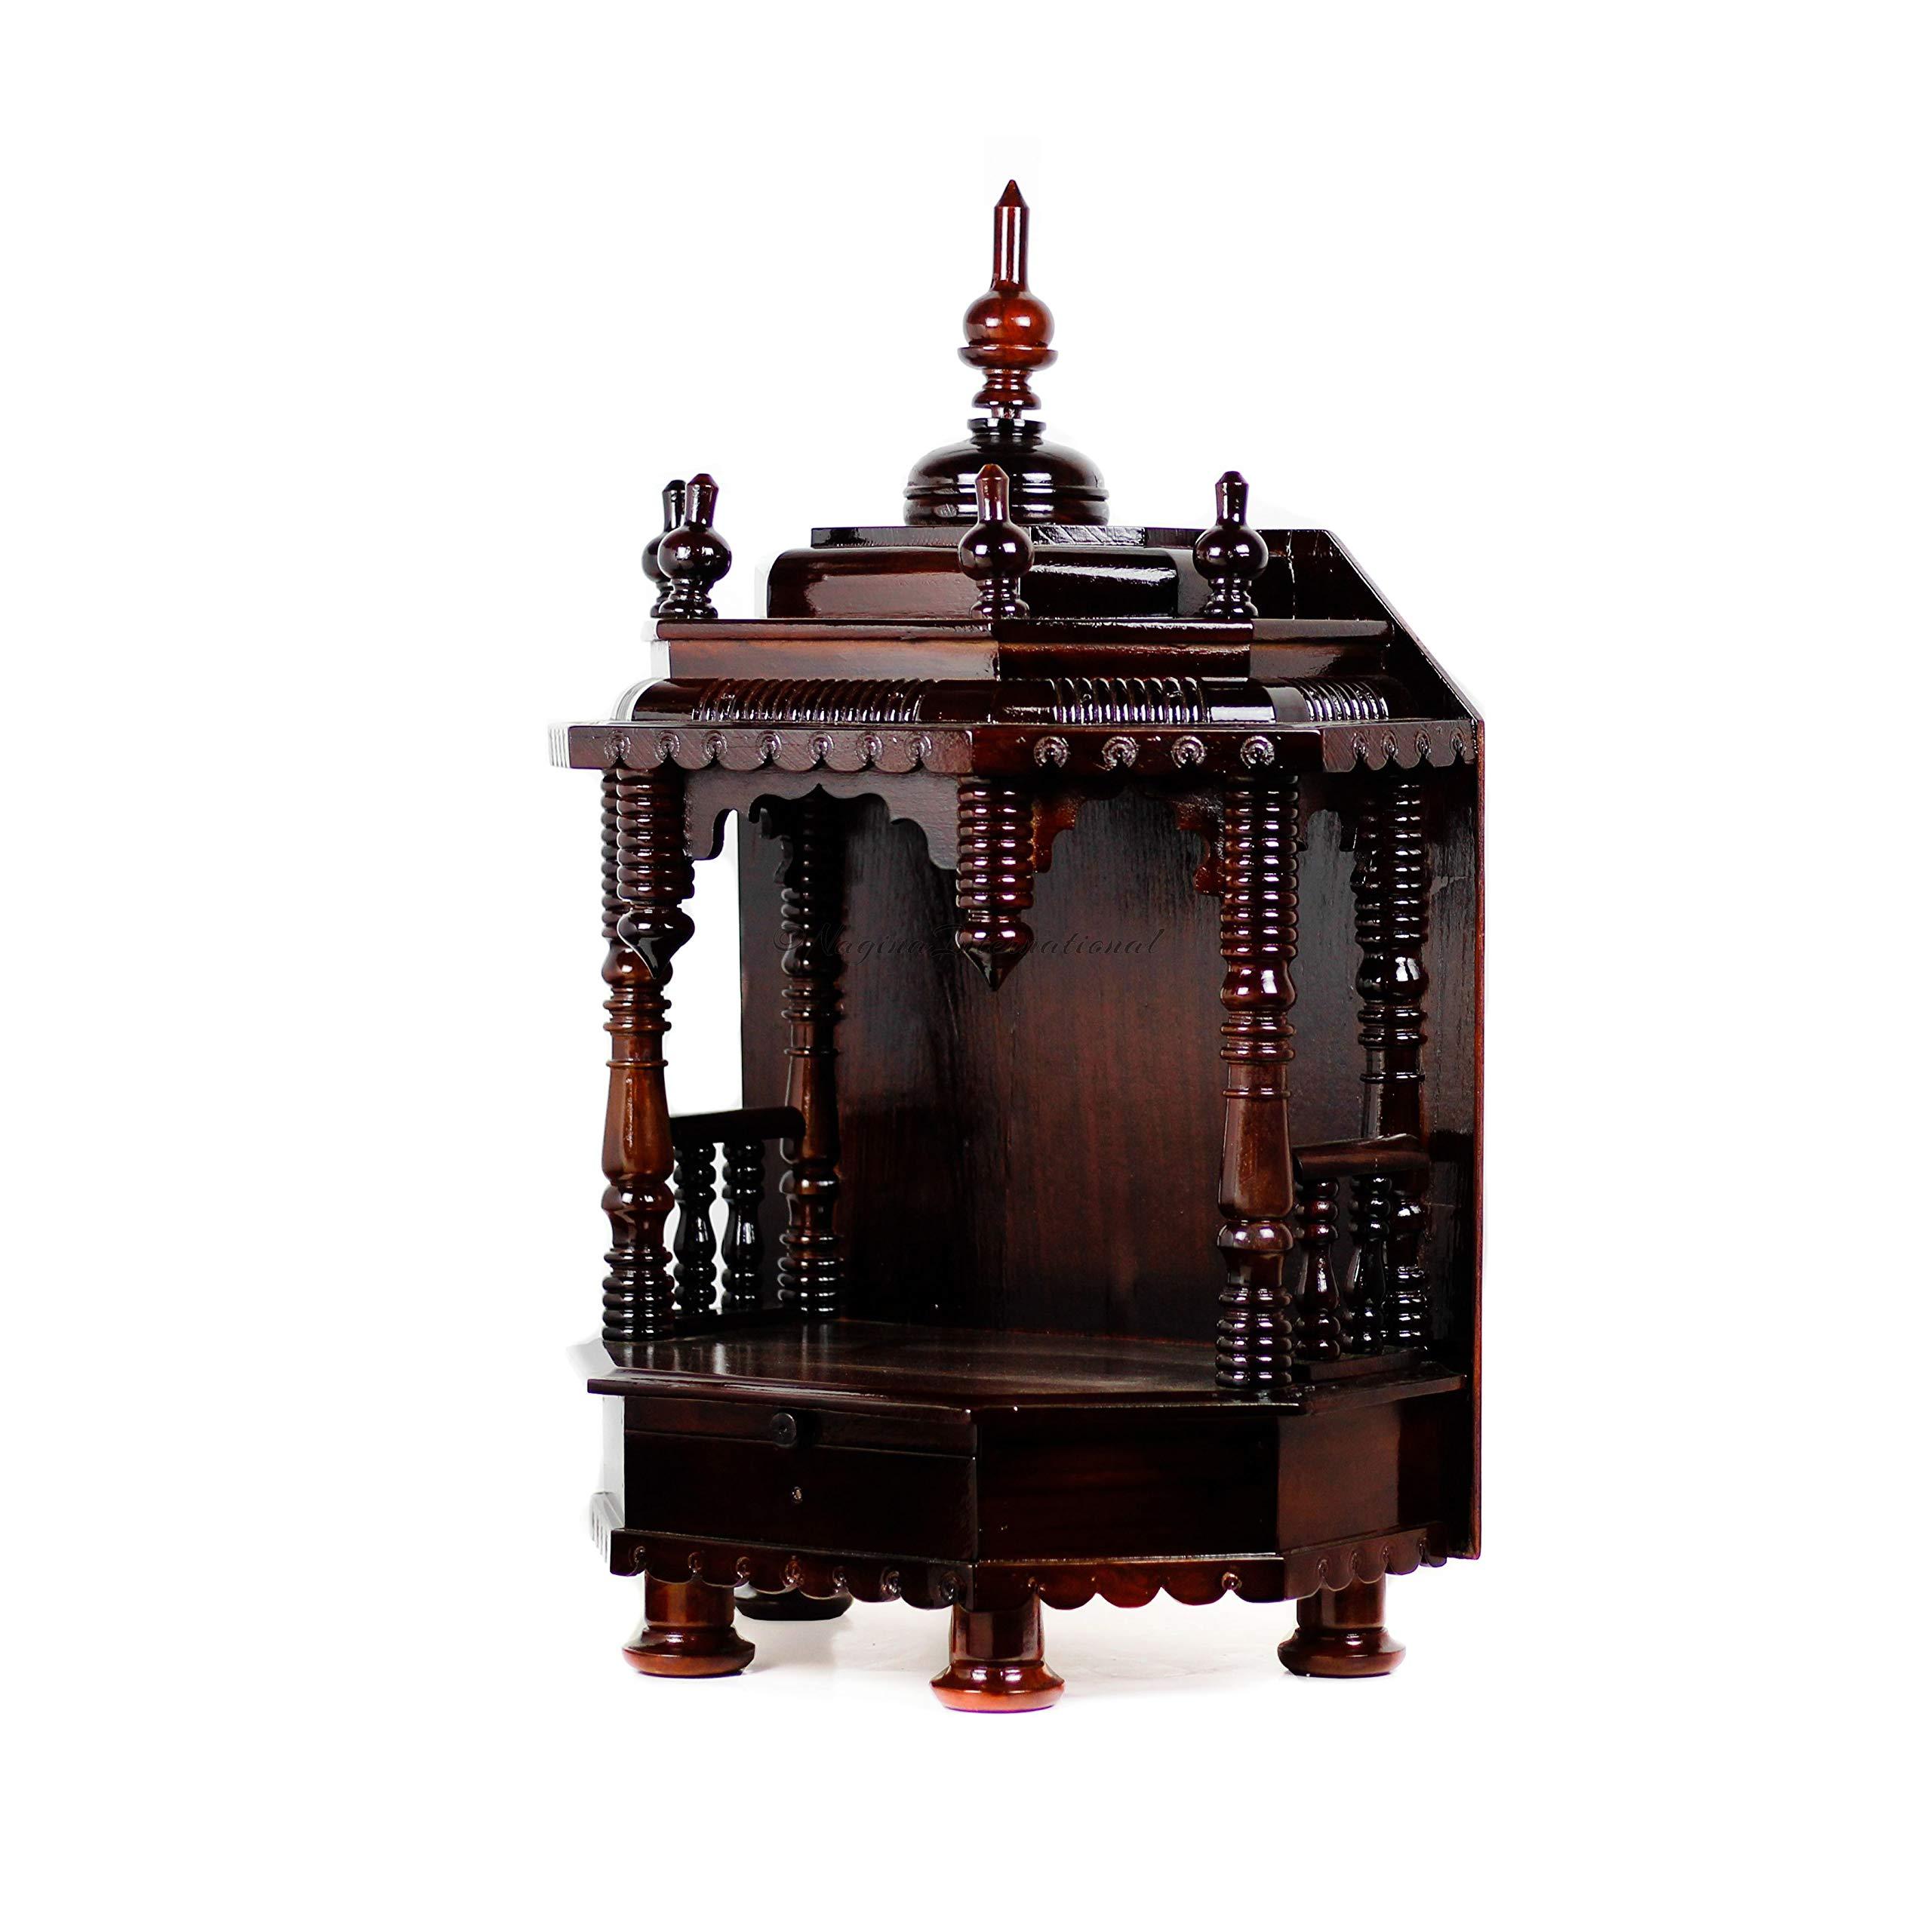 Nagina International Premium Hand Made Wooden Temple | Wooden Indian Mandir | Sheesham Wooden Madir (Dark Varnish) by Nagina International